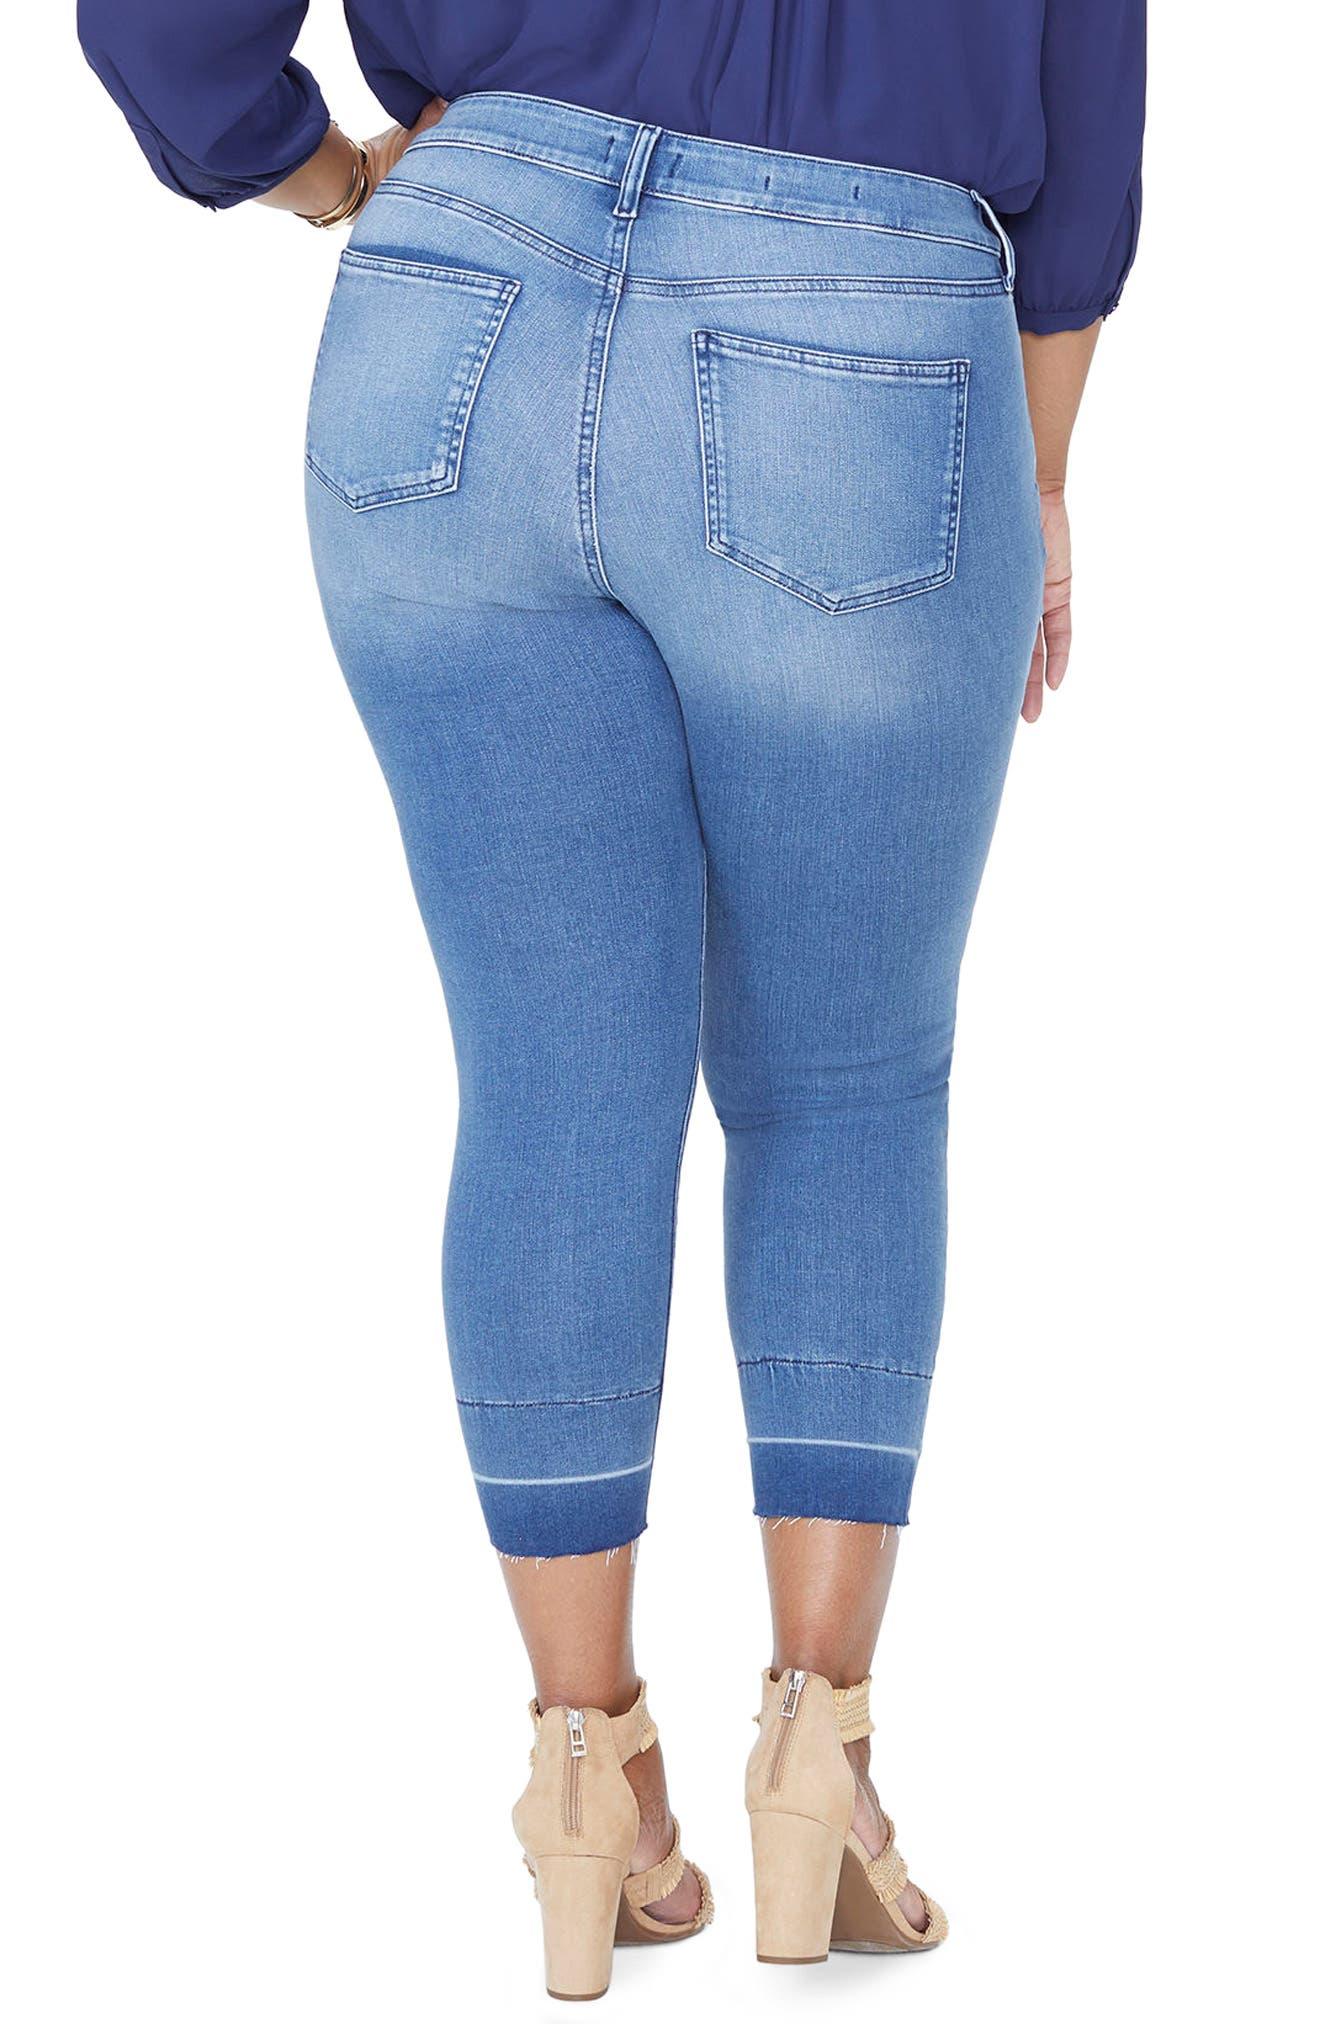 Alina Release Hem Ankle Skinny Jeans,                             Alternate thumbnail 2, color,                             Wishful